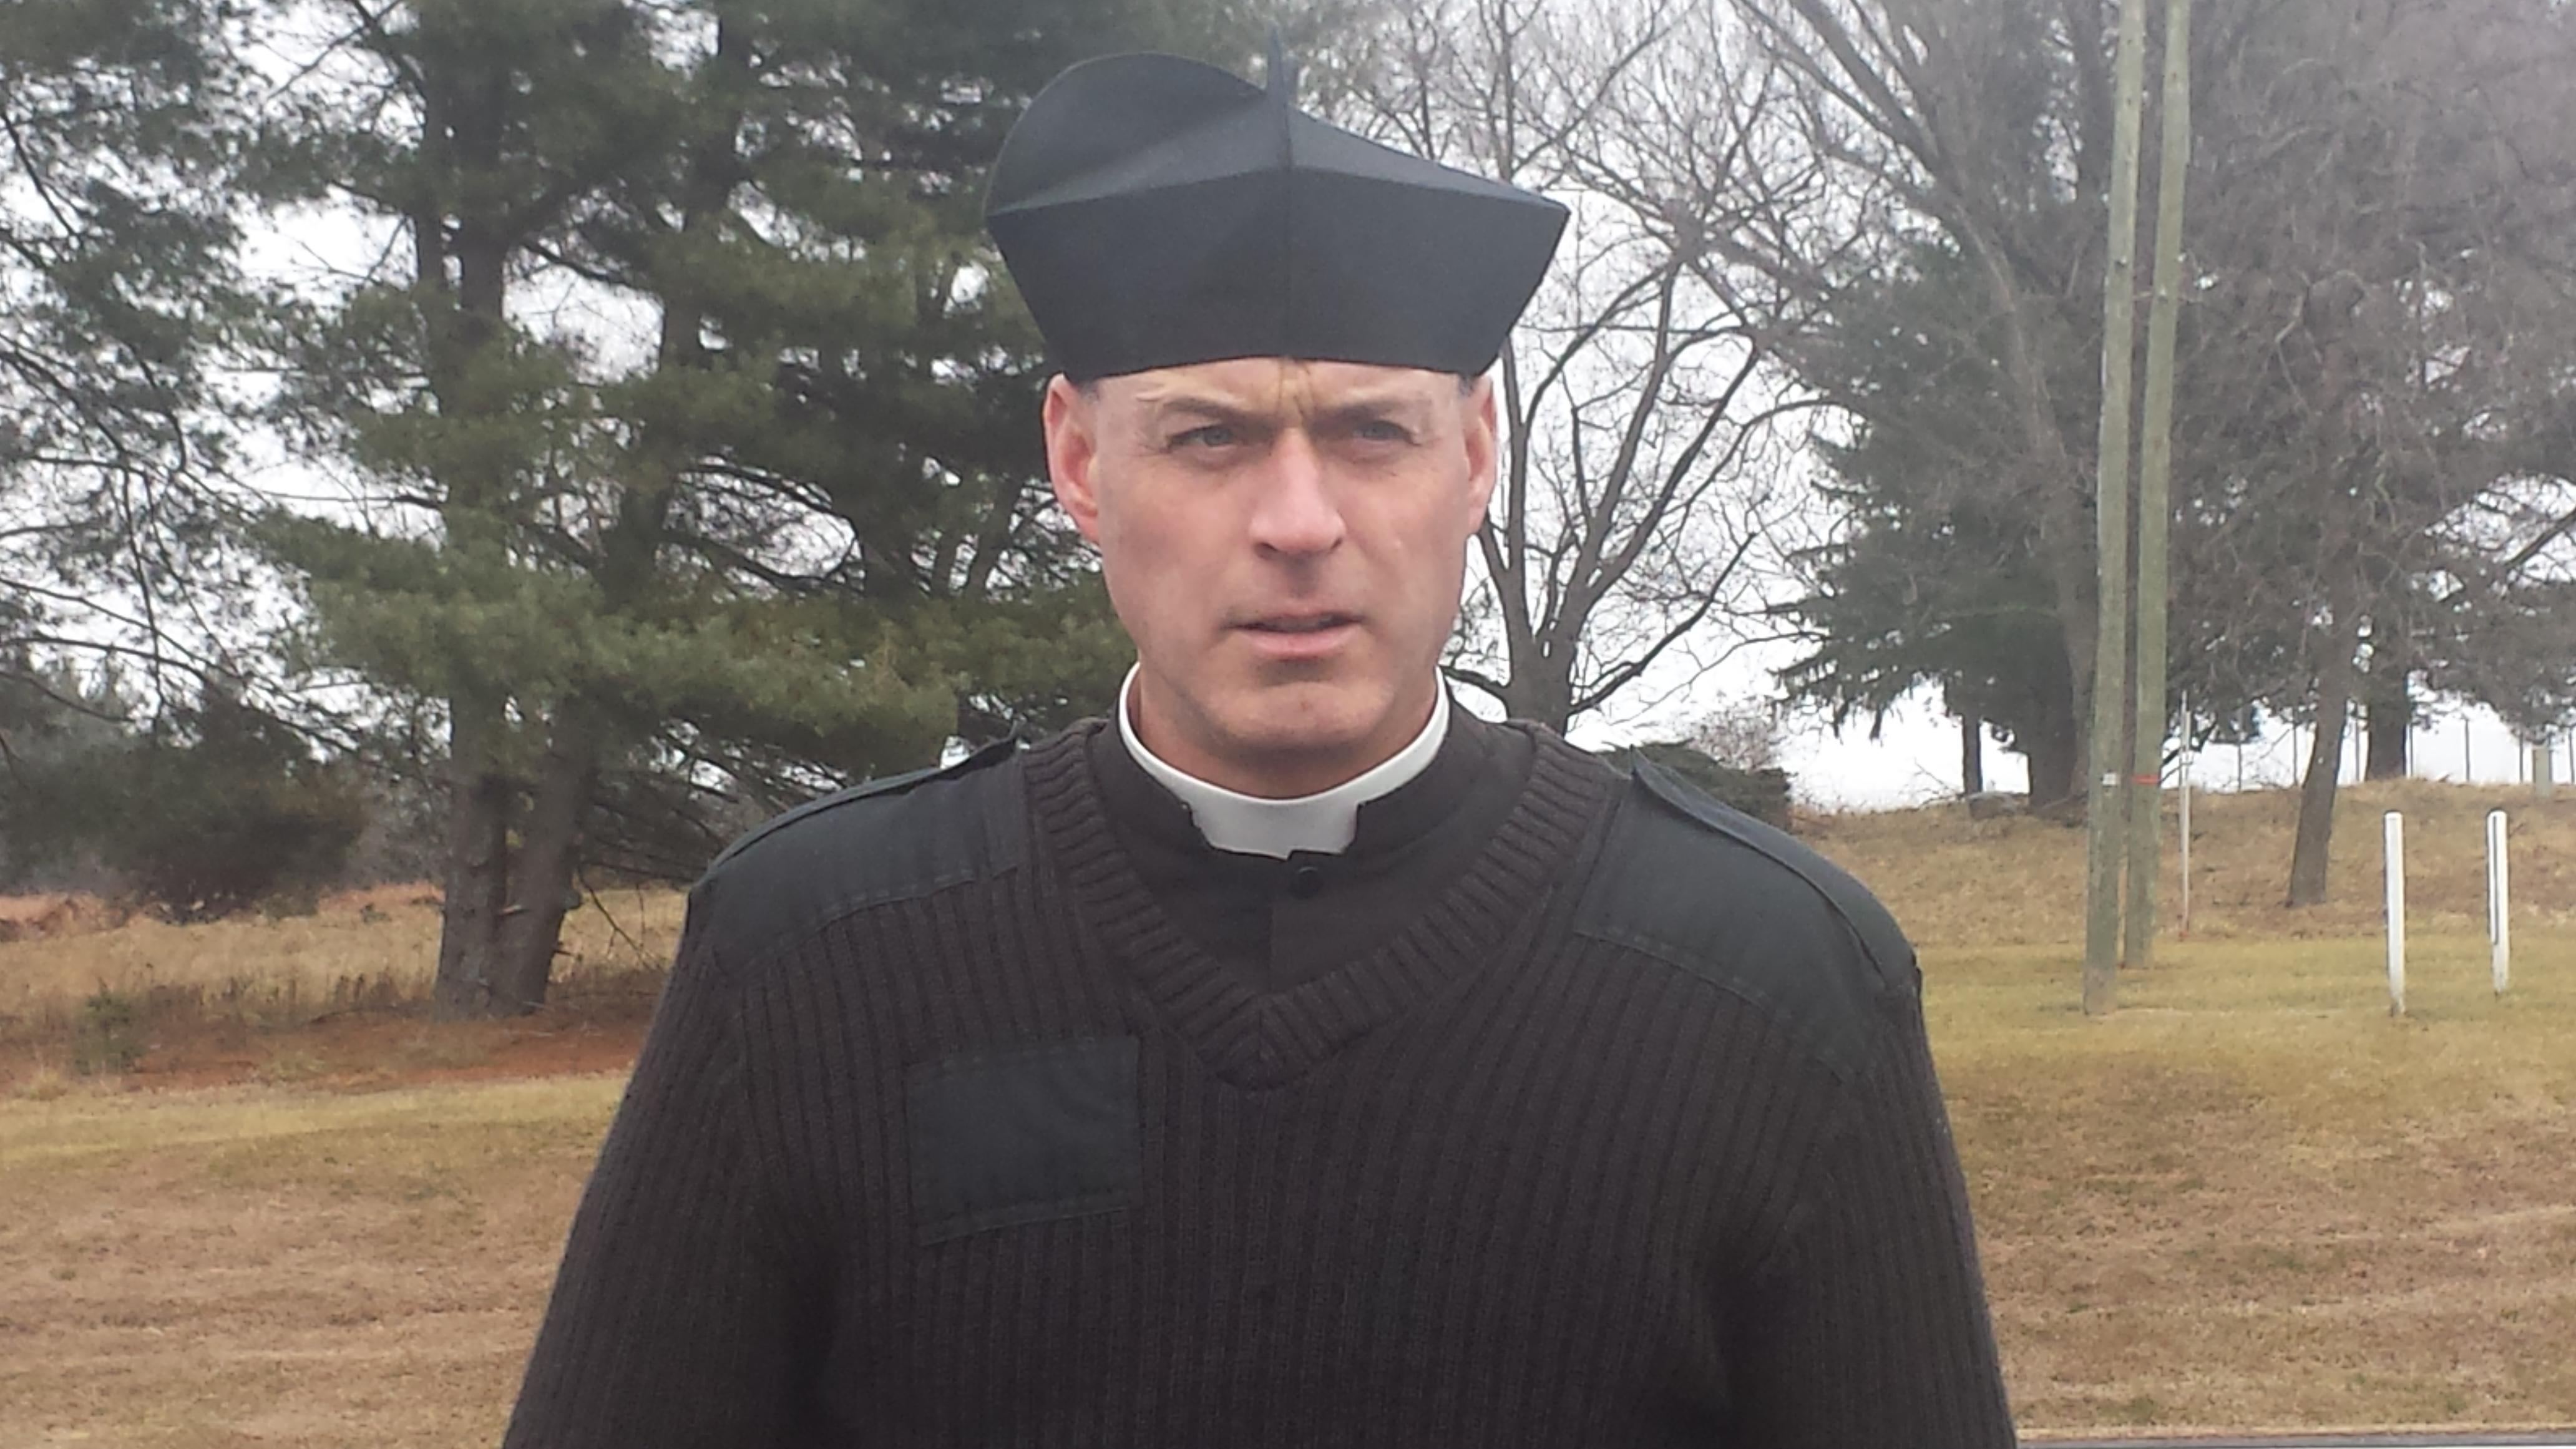 Reverend Father David Hewko